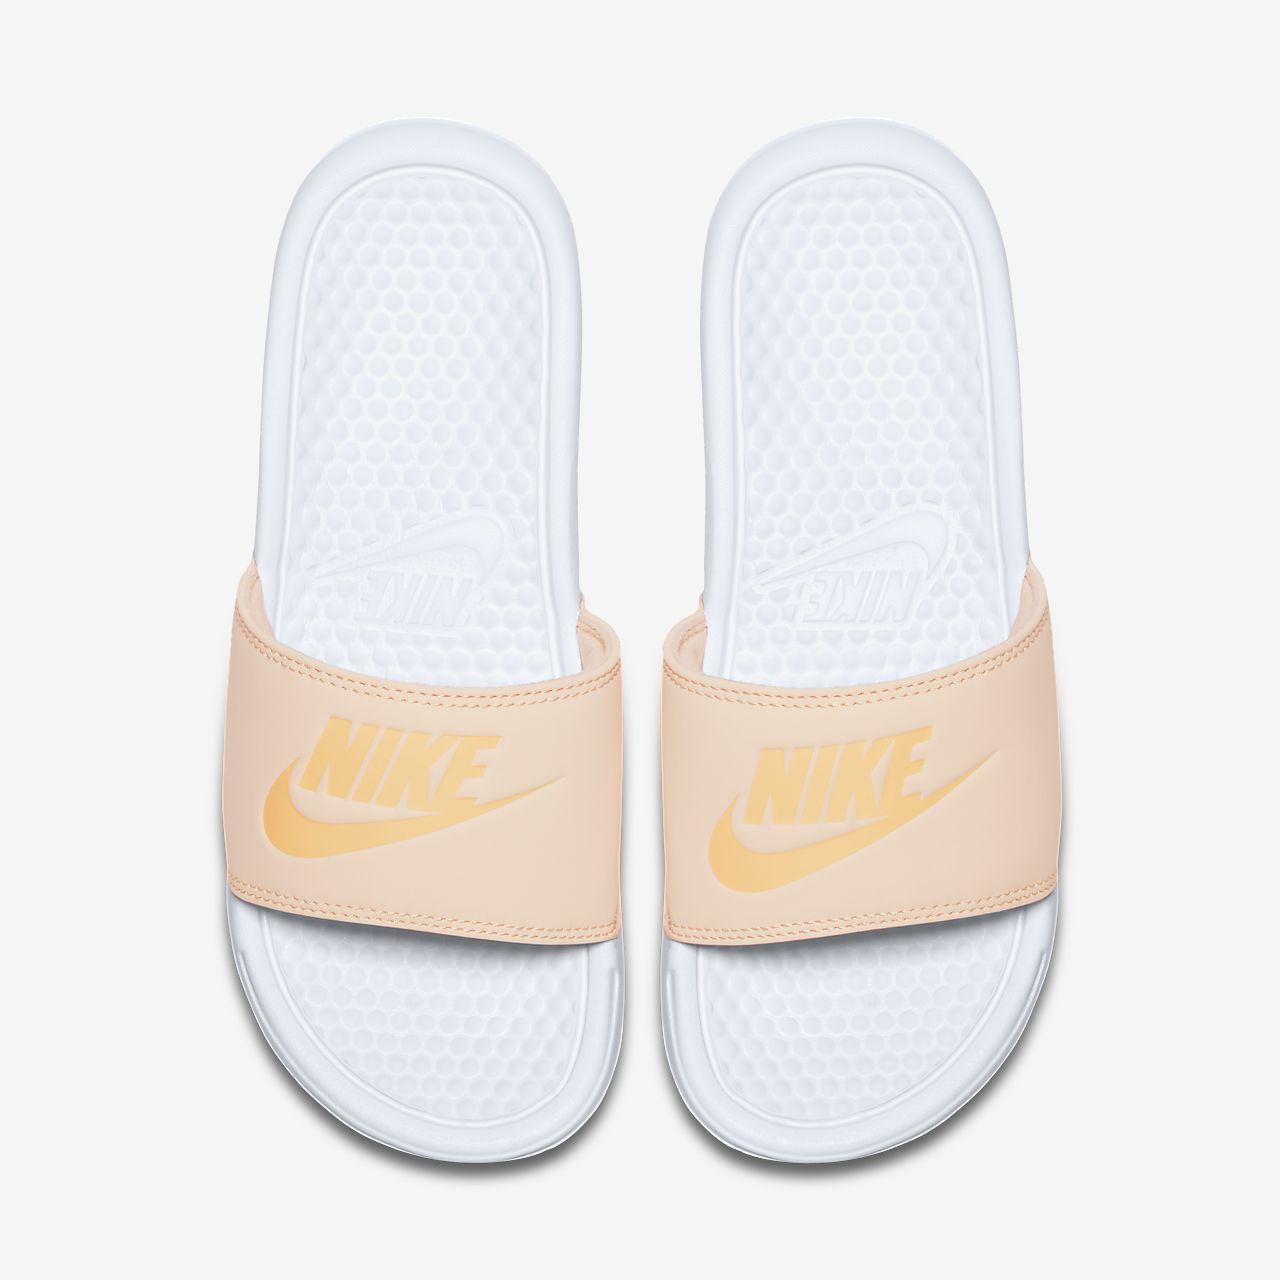 c5eb2a940 Nike Benassi Pastel QS Women s Slide. Nike.com CA